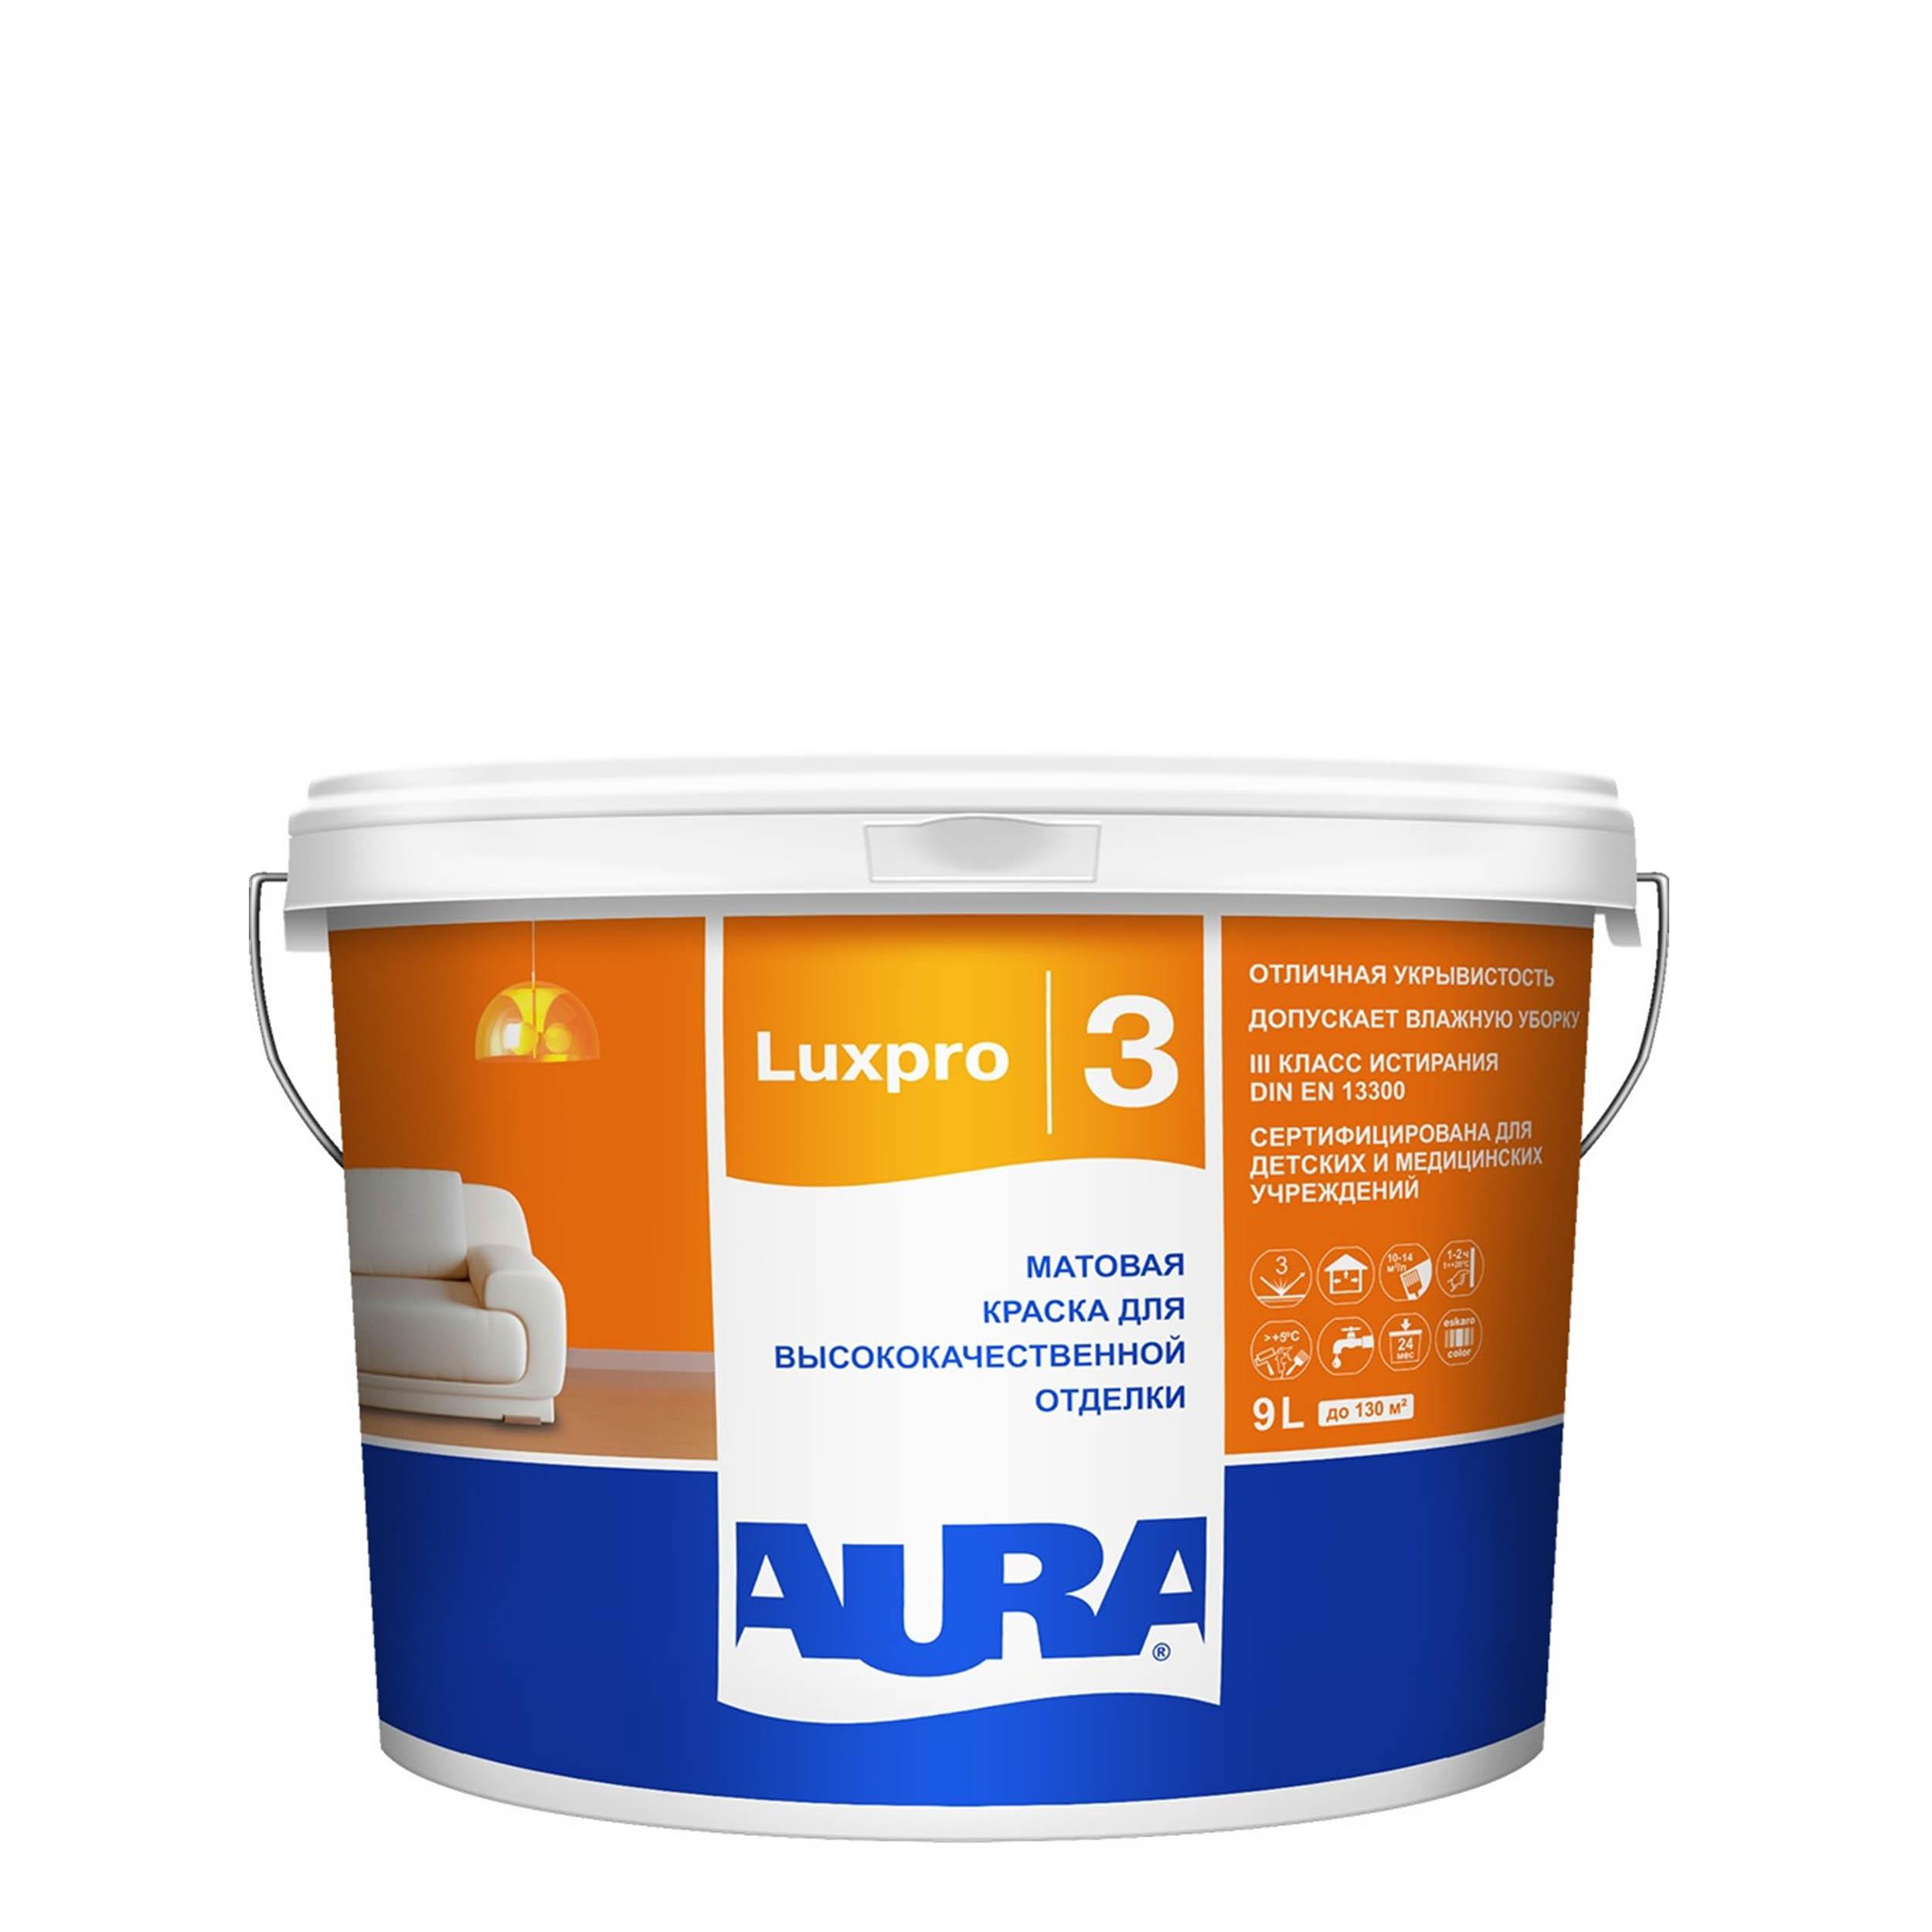 Фото 3 - Краска интерьерная, Aura LuxPRO 3, RAL 8004, 11 кг.